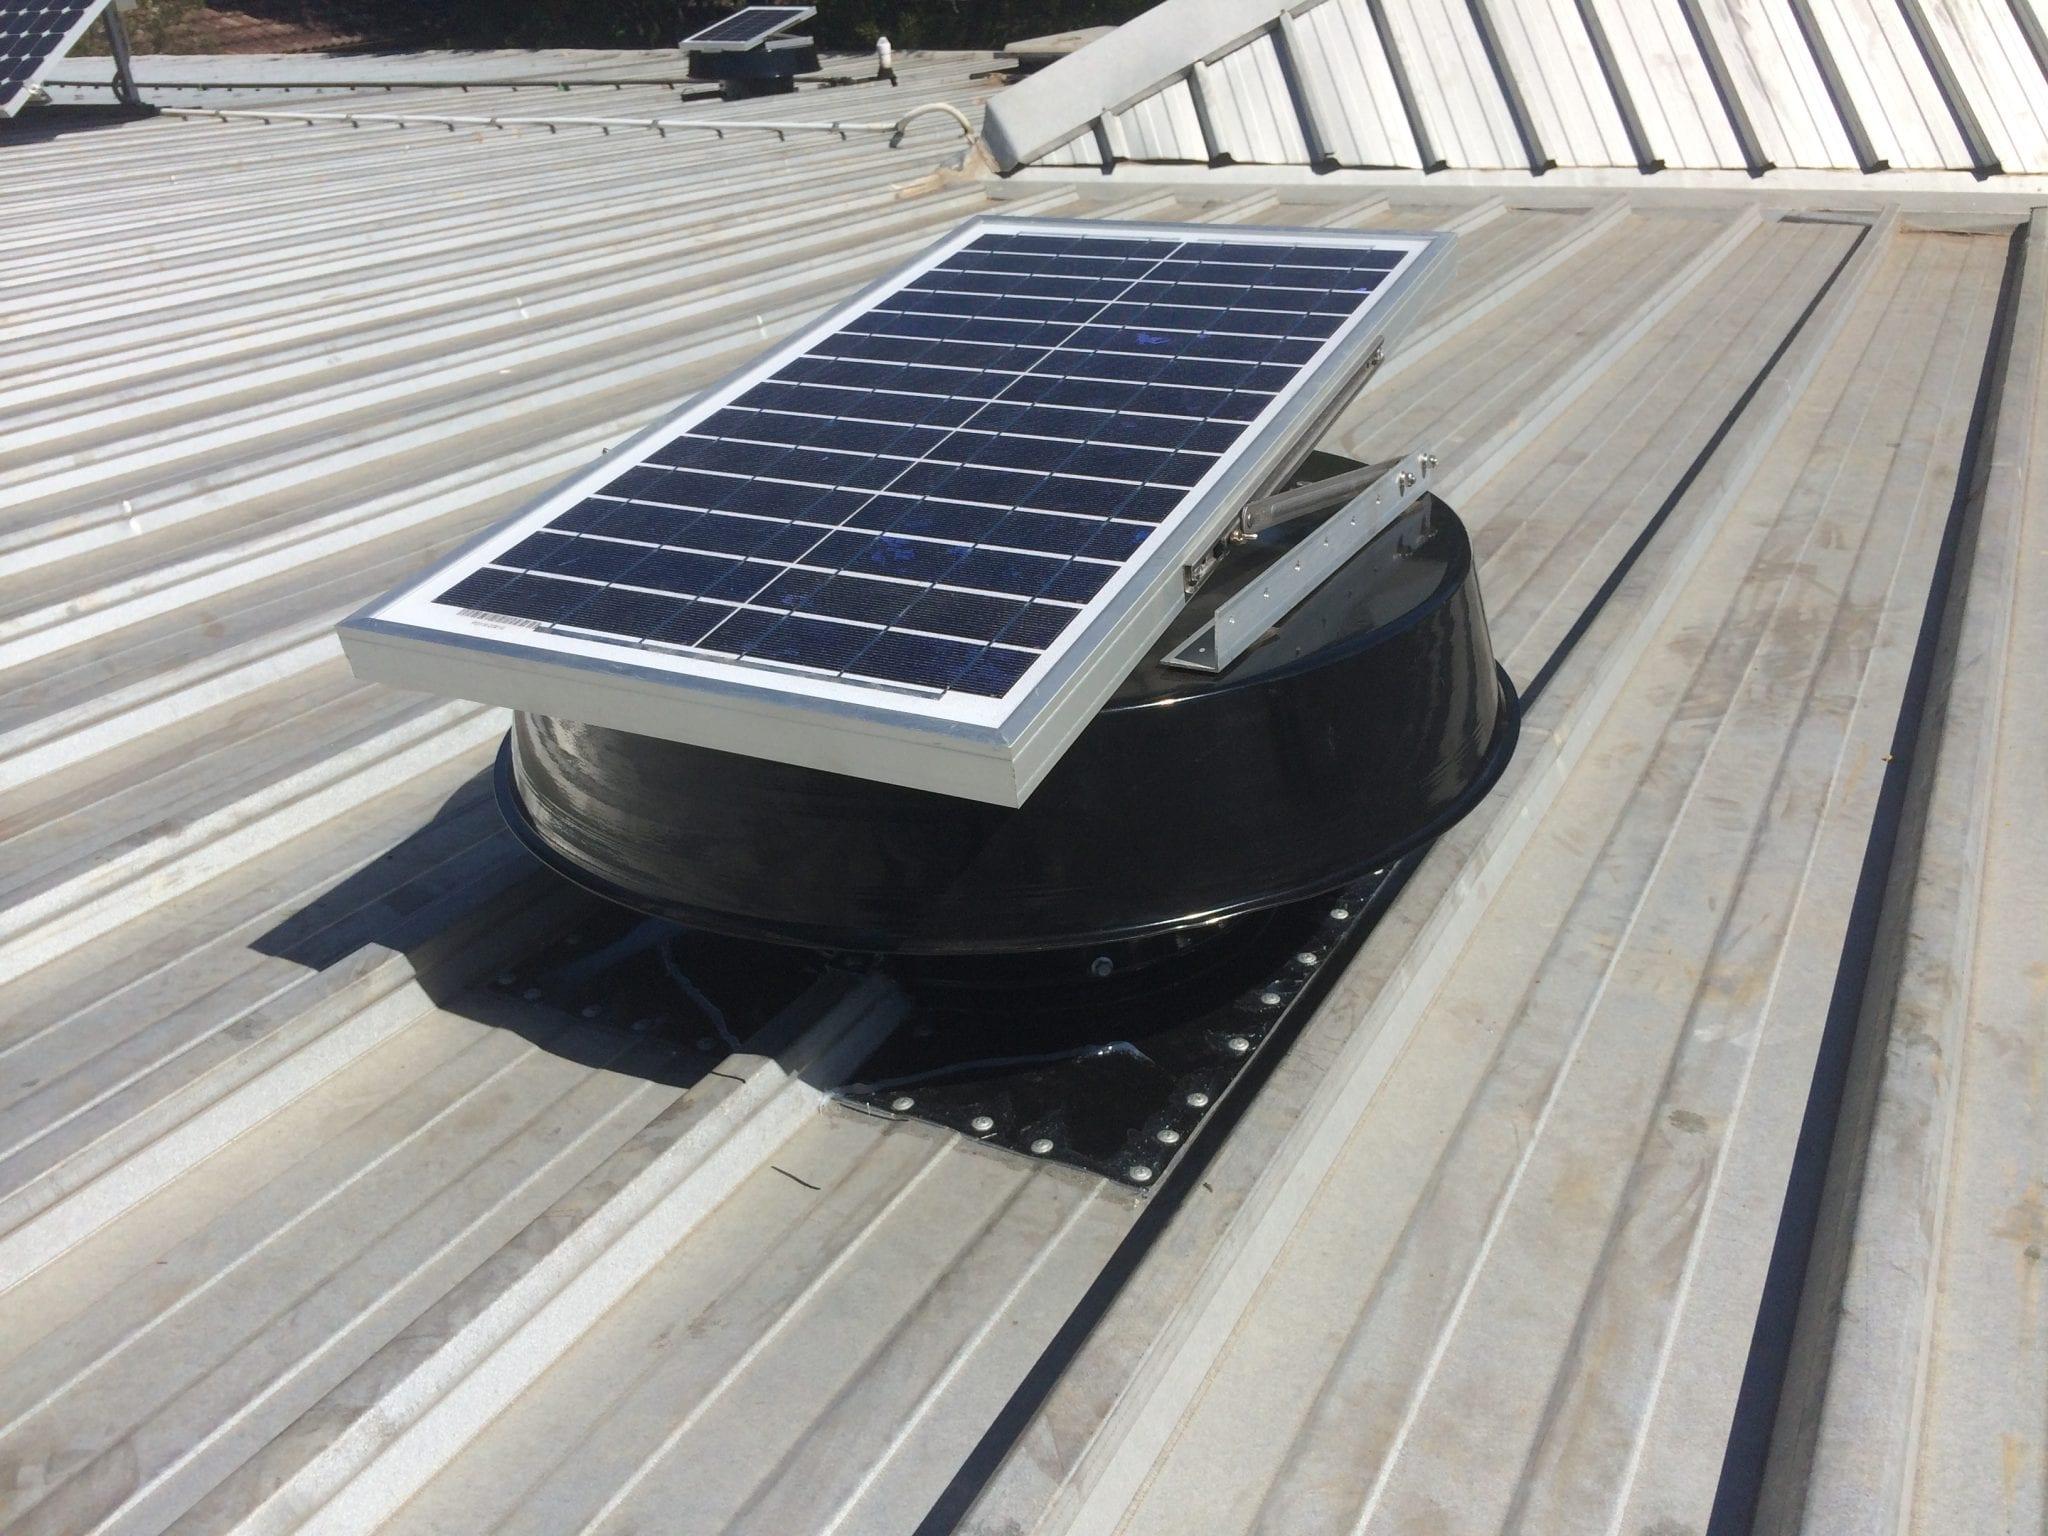 solar whiz panel on house